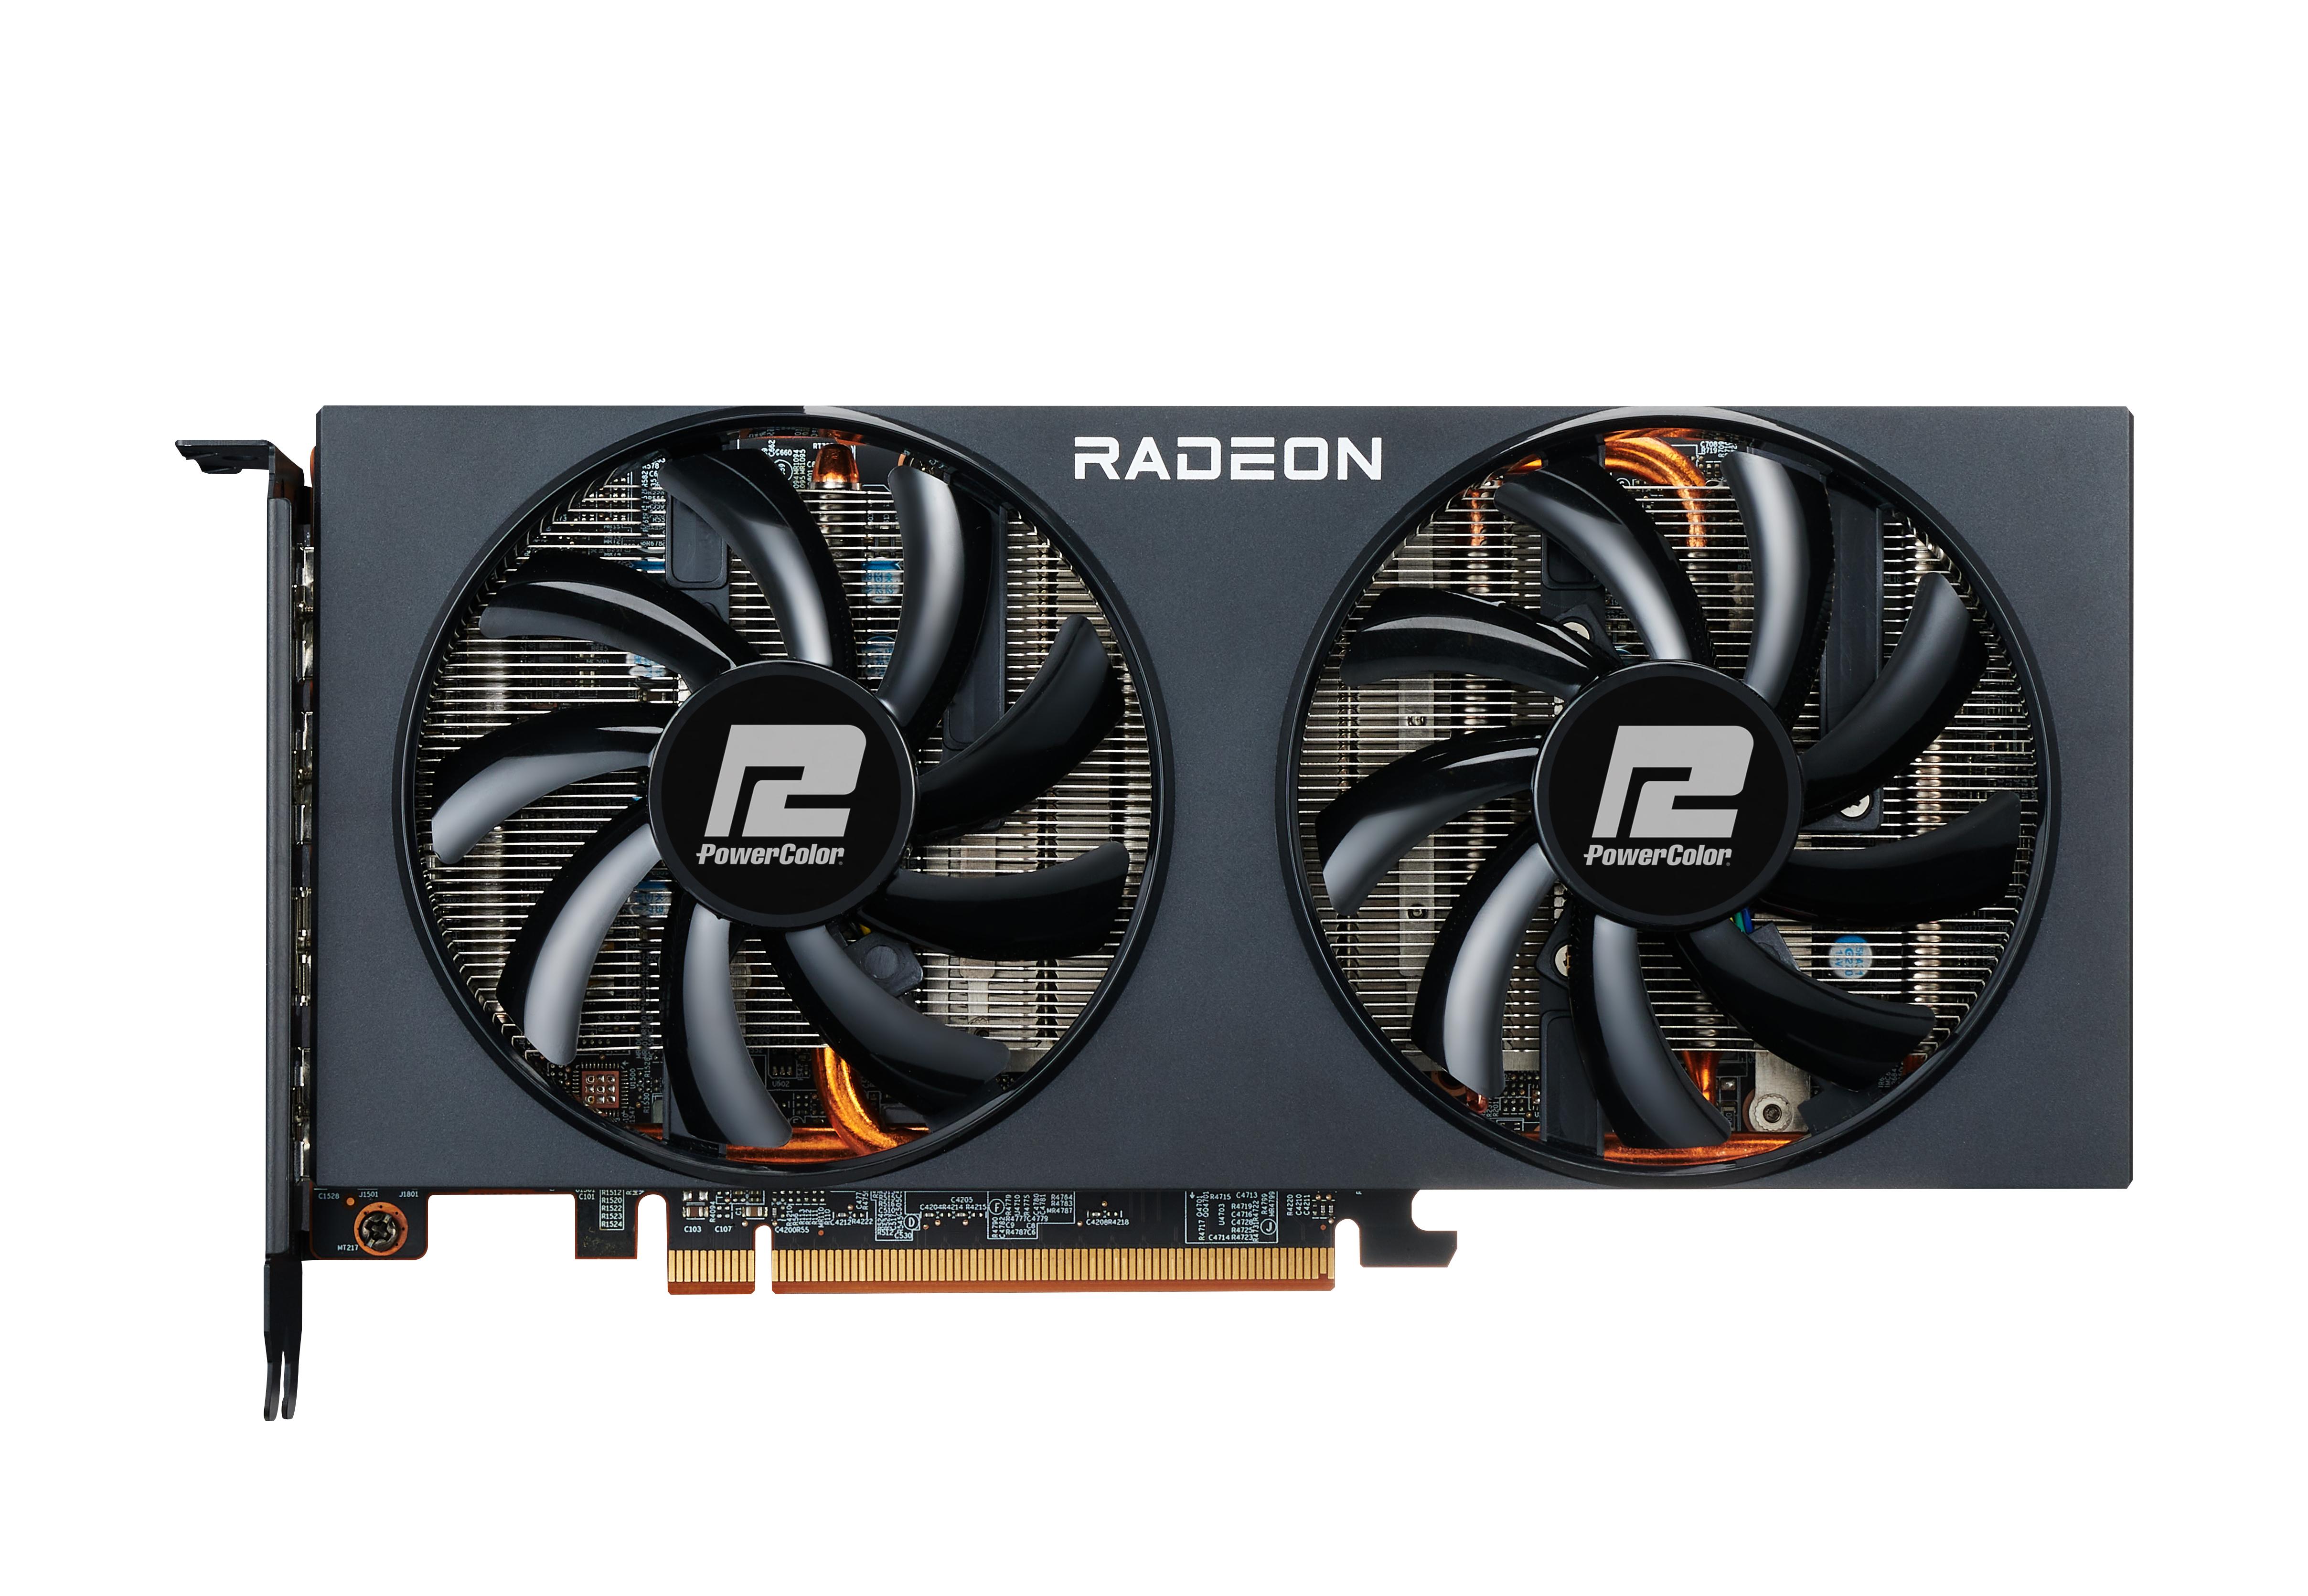 Vorschau: PowerColor AXRX 6700XT 12GBD6-3DH - Radeon RX 6700 XT - 12 GB - GDDR6 - 192 Bit - PCI Express 4.0 - 2 Lüfter